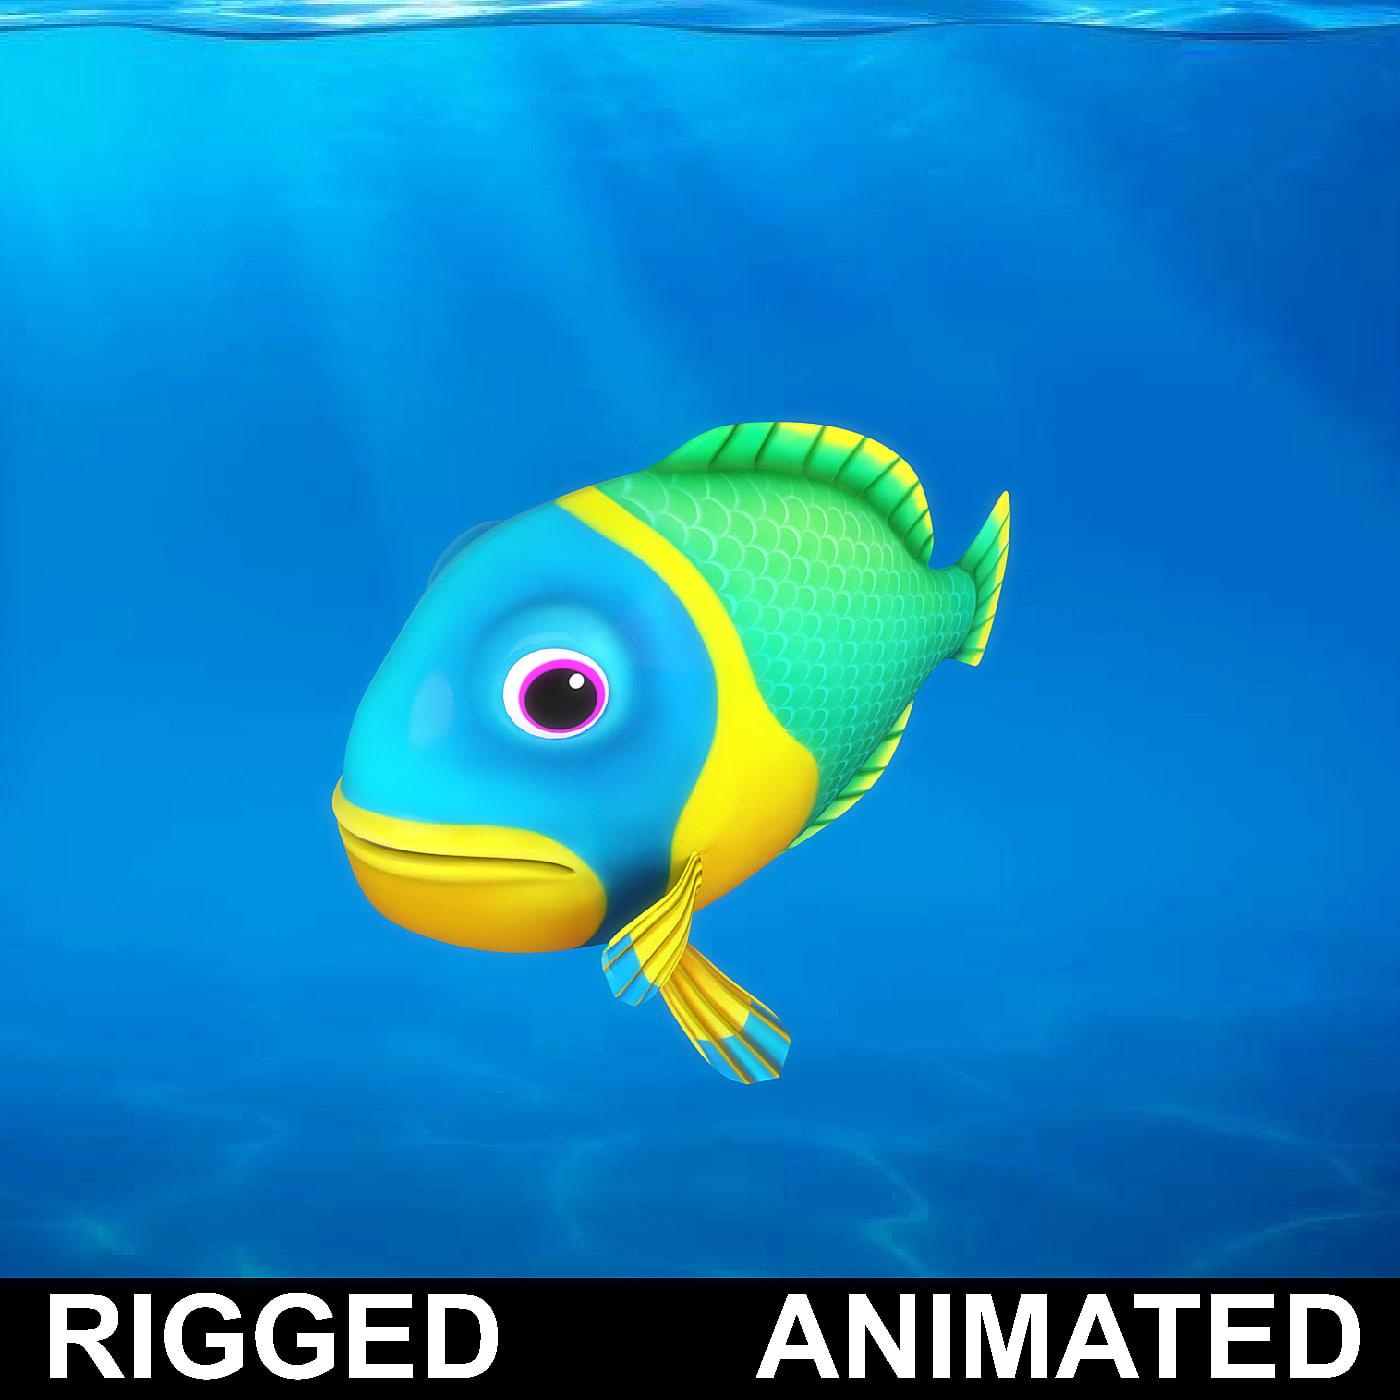 cartoon underwater scene rigged animated 3d model - HD1400×1400